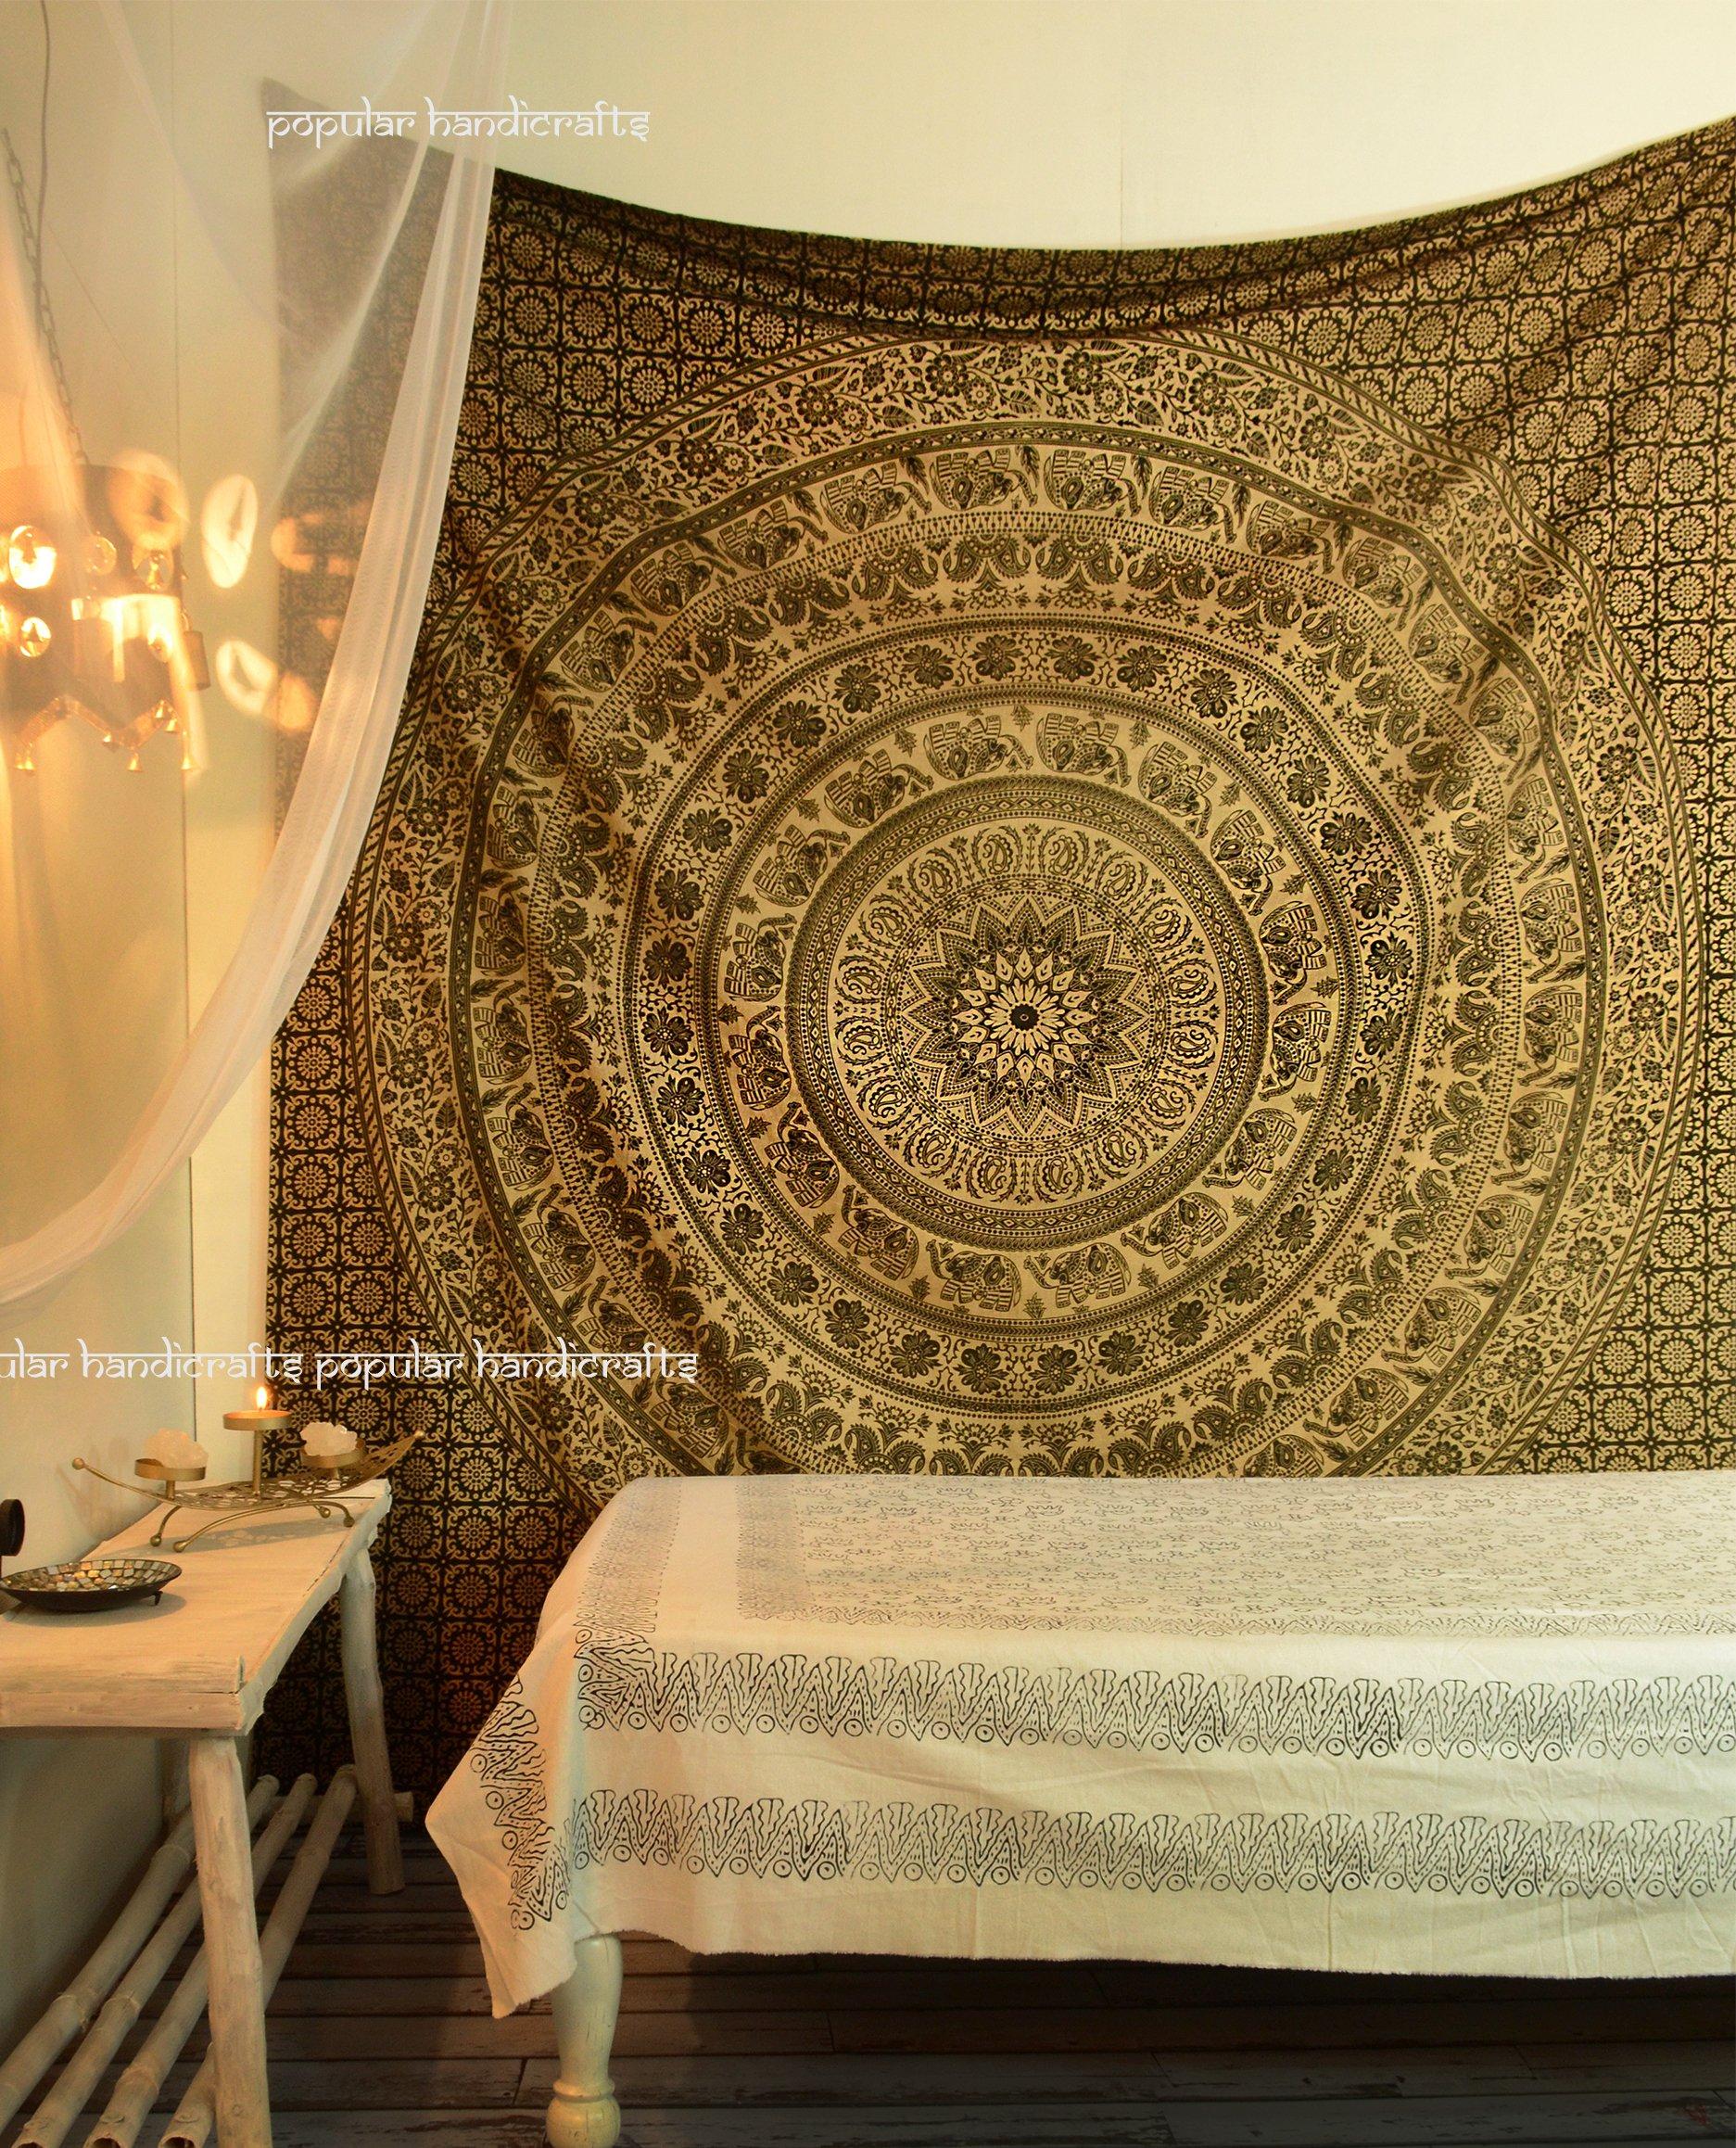 Popular Handicrafts d Kp714 Elephant Tapestry Wall Hanging Hippie Bohemian Mandala Wall Art With Metallic Shine tapestries (215x230cms) Gold on Black dye